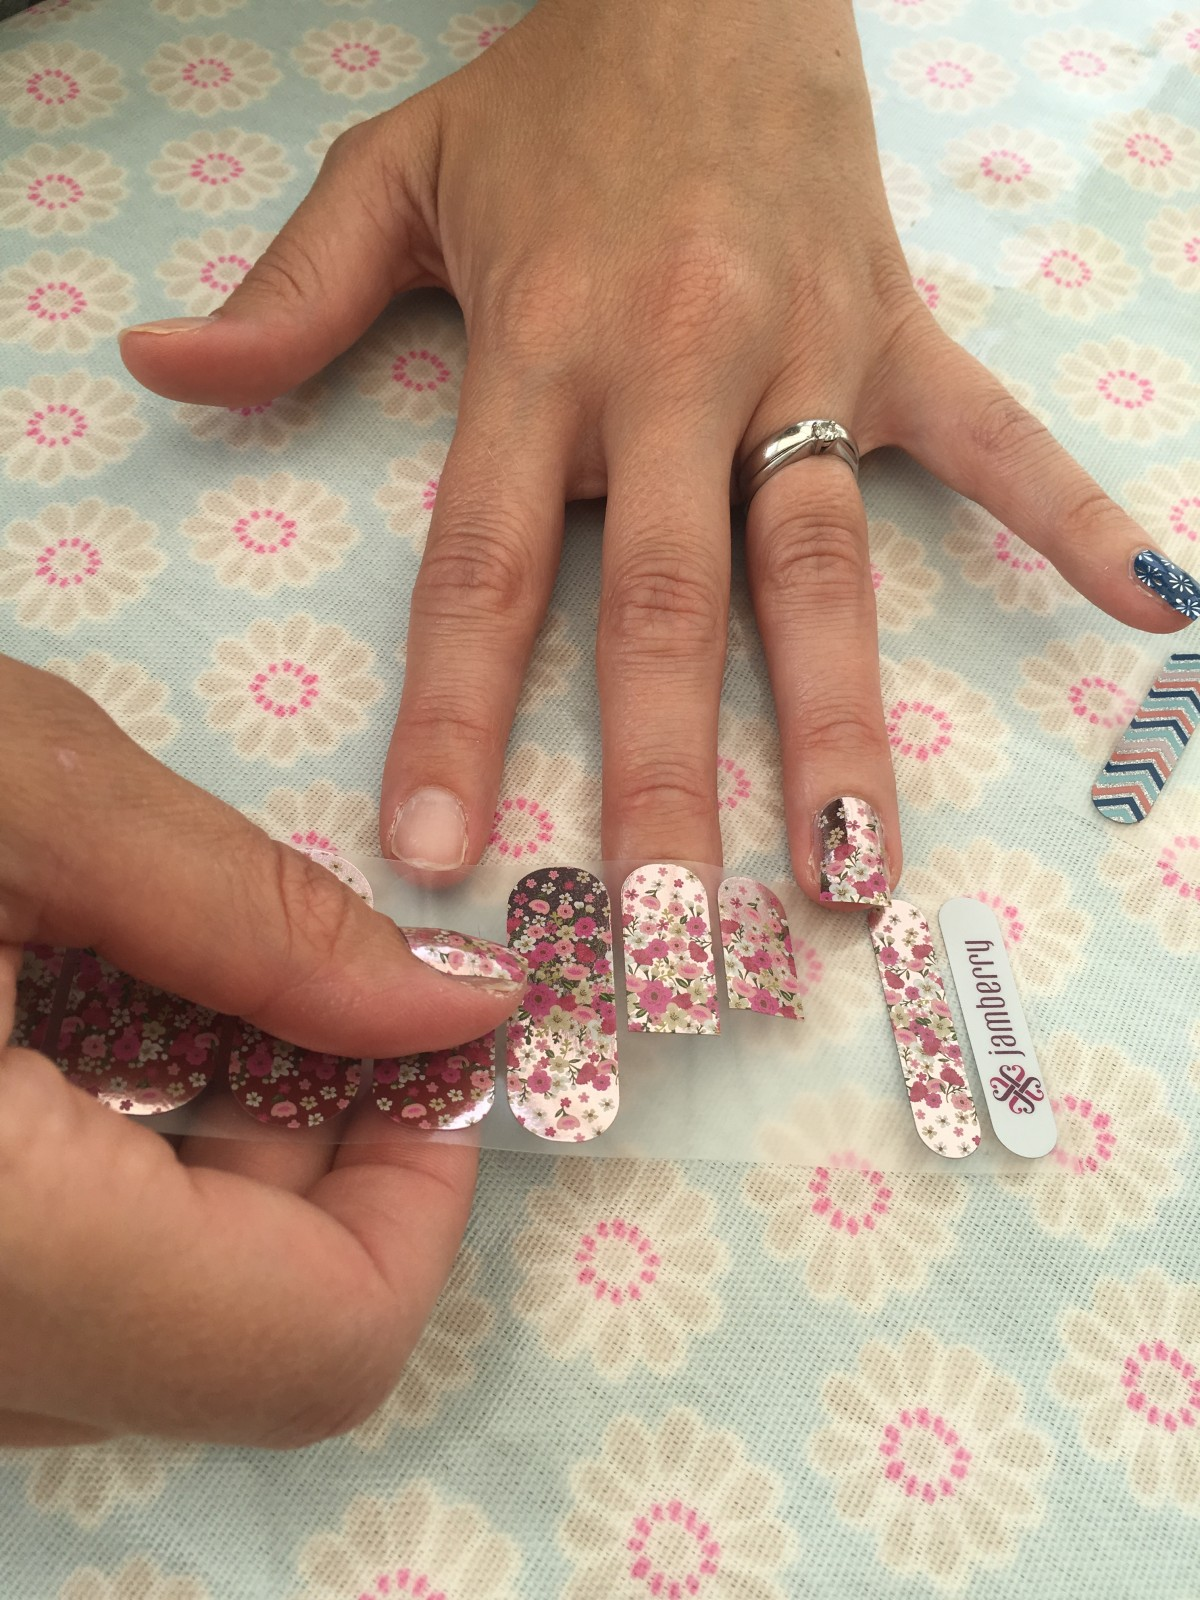 Harrogate Mama, Harrogate Mama Blog, Jamberry, Nails, Nail Wraps, Harrogate, Yorkshire, Blogger, Harrogate, Mama, Blog,IMG_0913.jpg